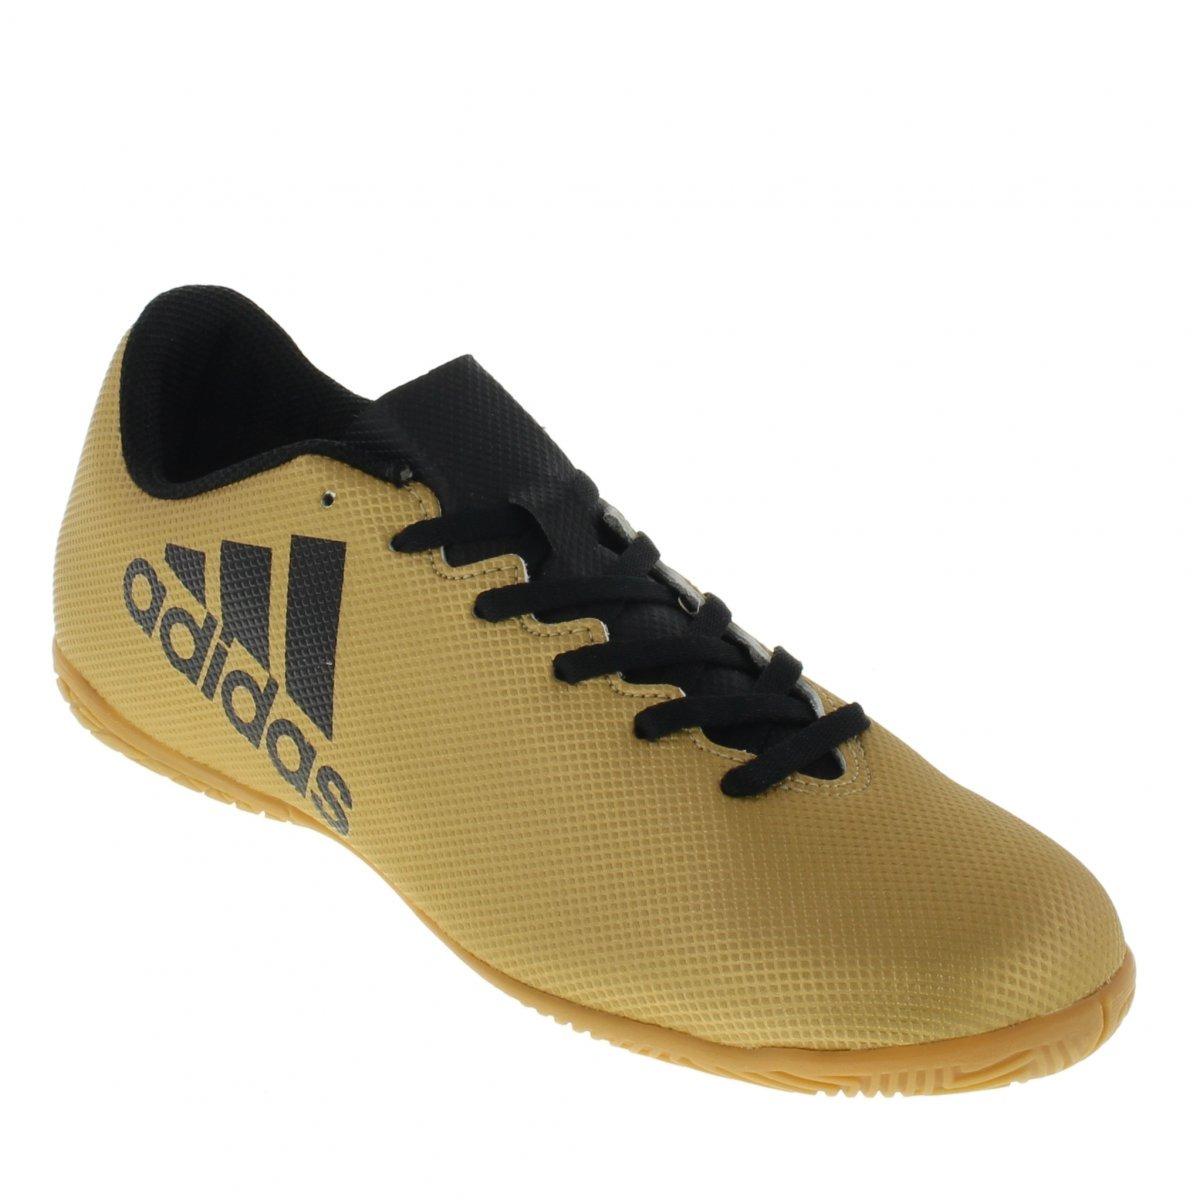 chuteira futsal adidas x tango 17.4 in masculina original. Carregando zoom. 24dc366b20c9c